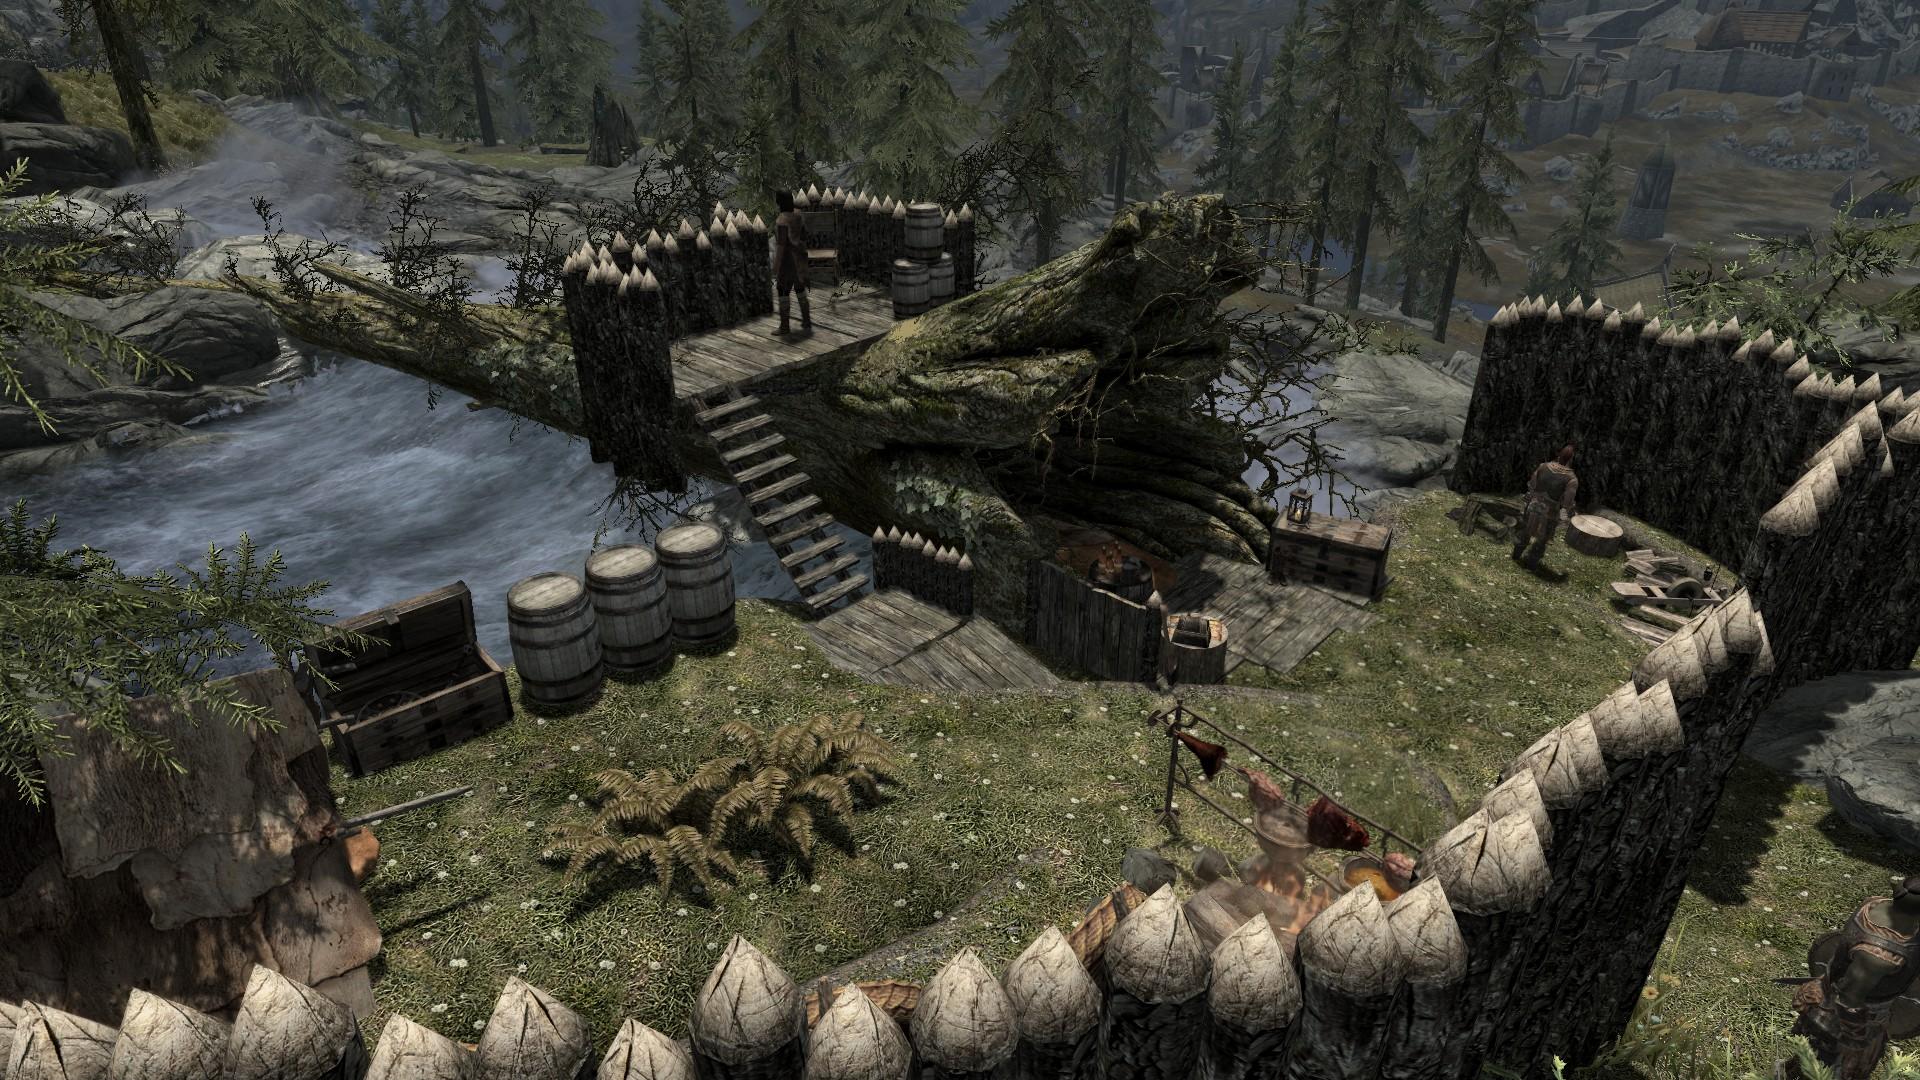 Thorn_River_Crossing__2_.jpg